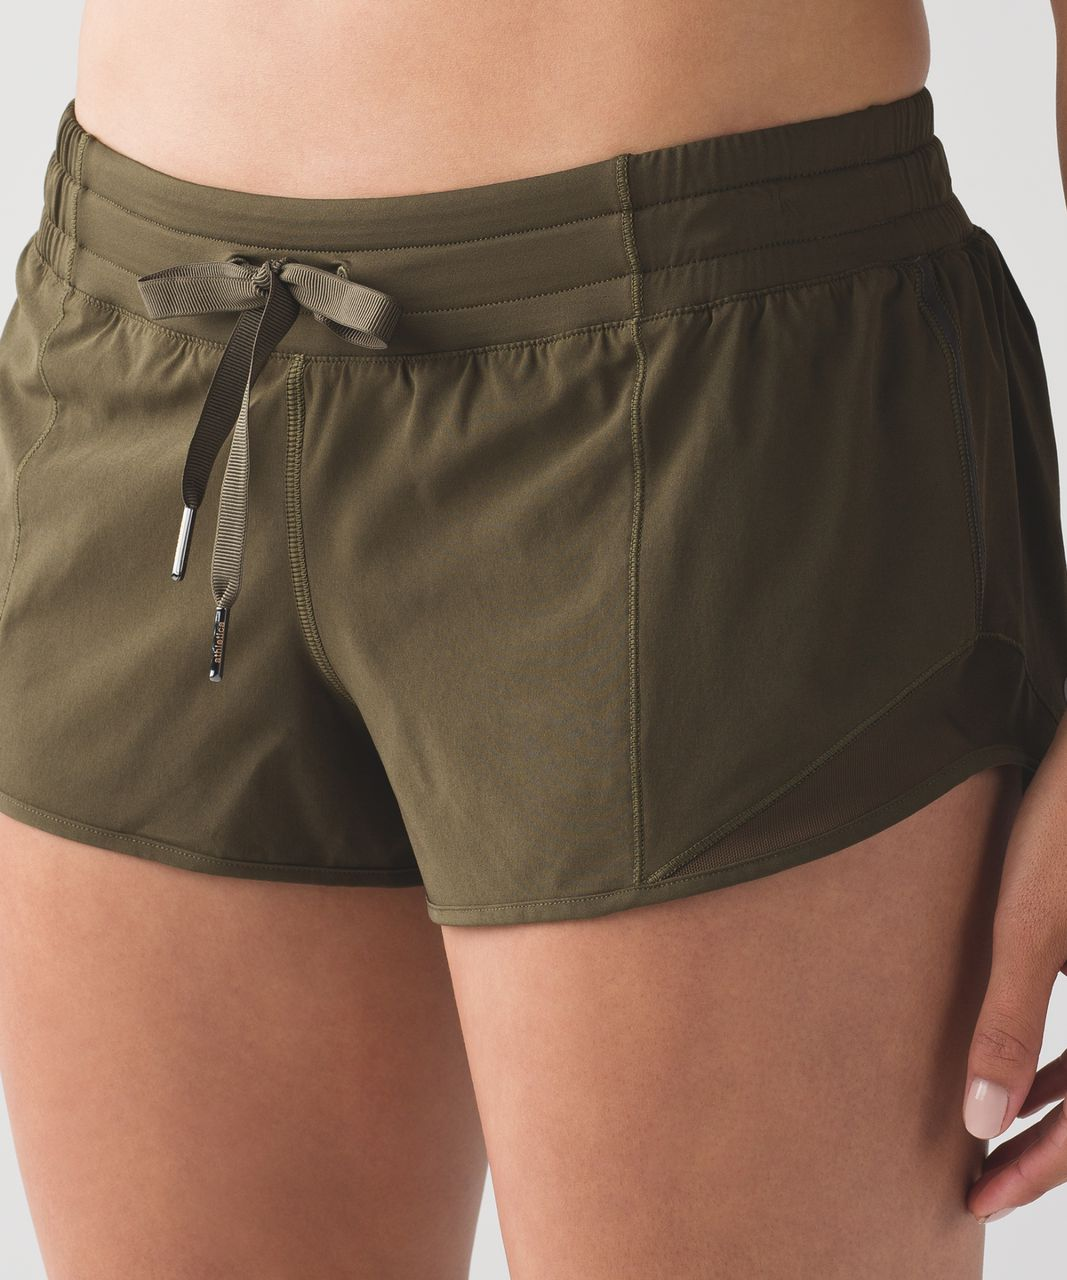 Lululemon Hotty Hot Short - Military Green